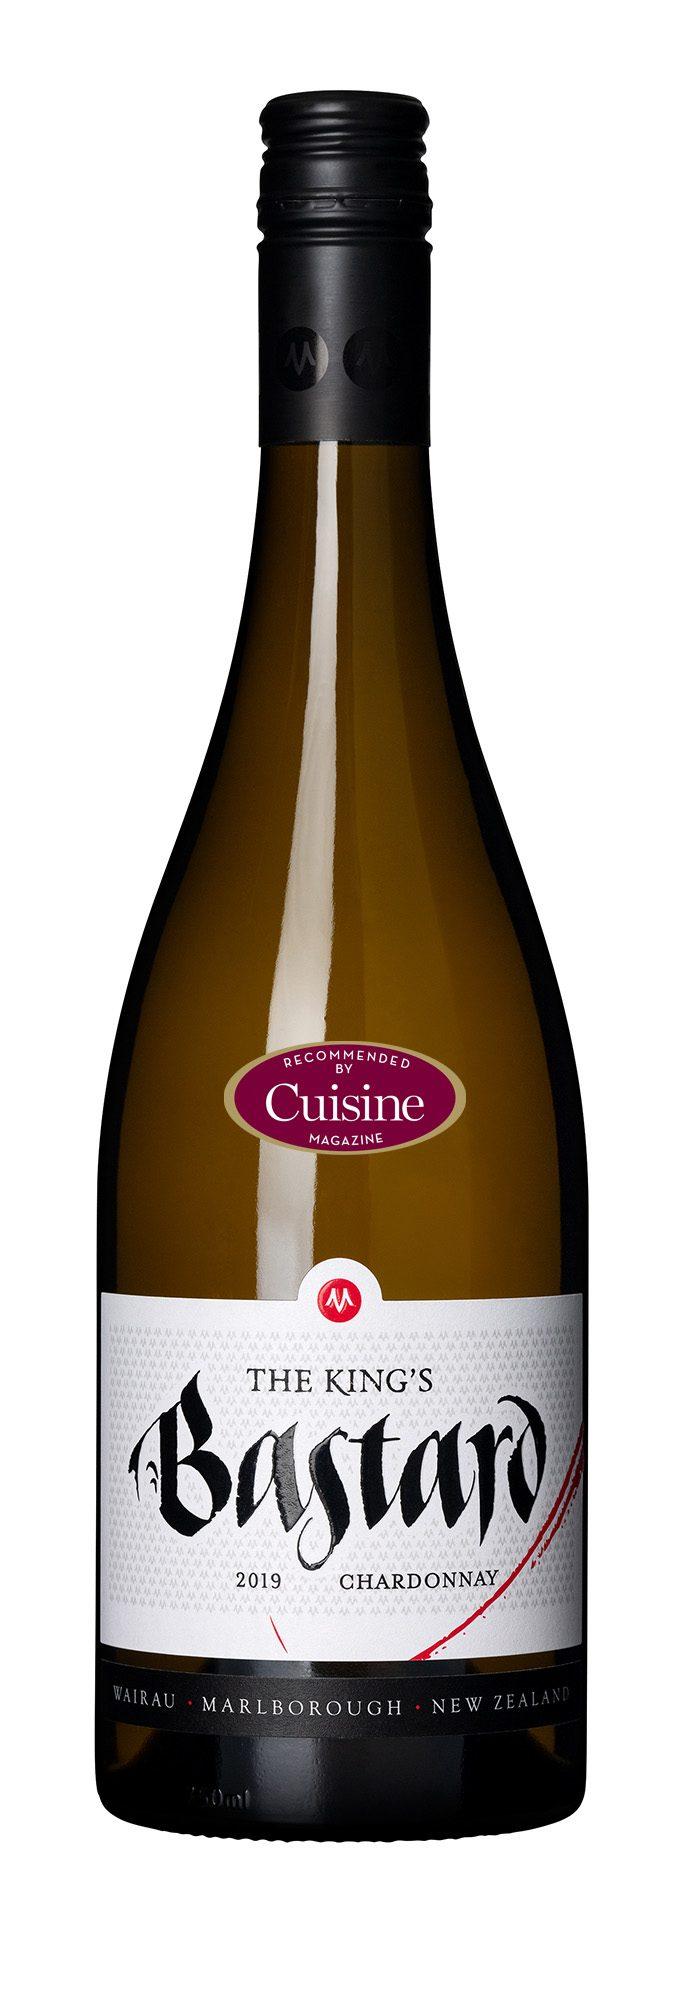 Marisco The King's Bastard Chardonnay 2019 Marlborough